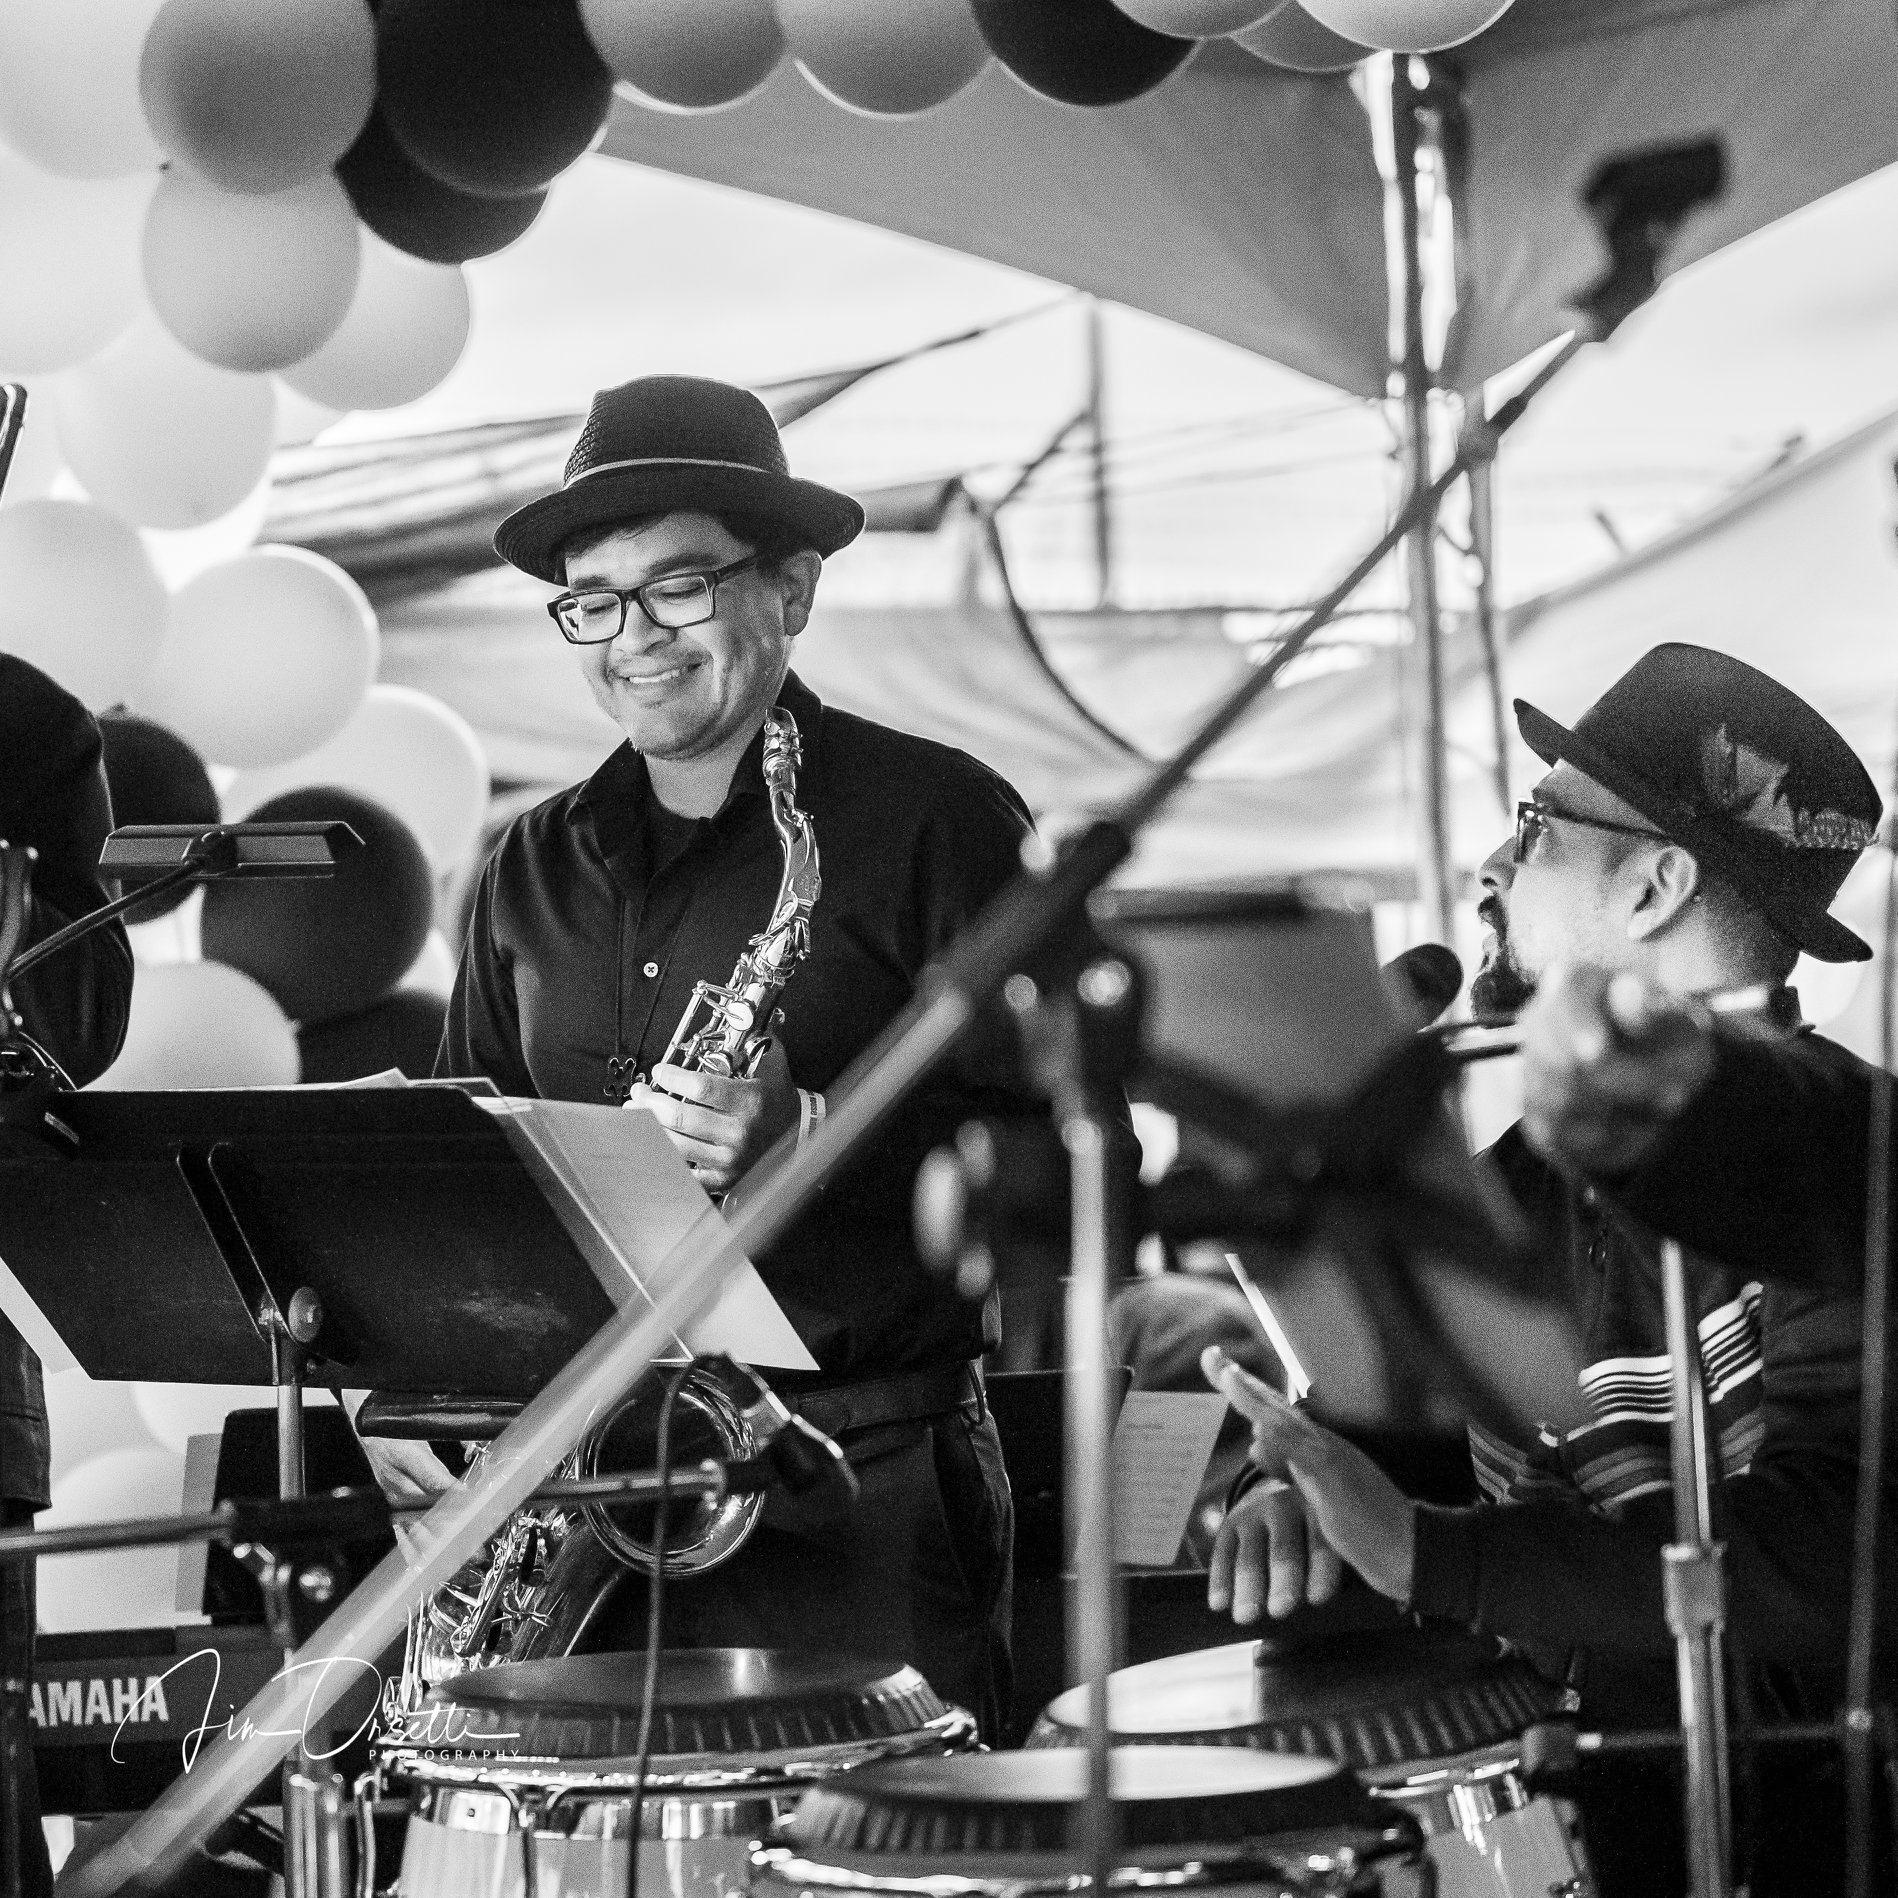 Cabanijazz at the 2nd Annual 7 Mile House Jazz Fest 2019